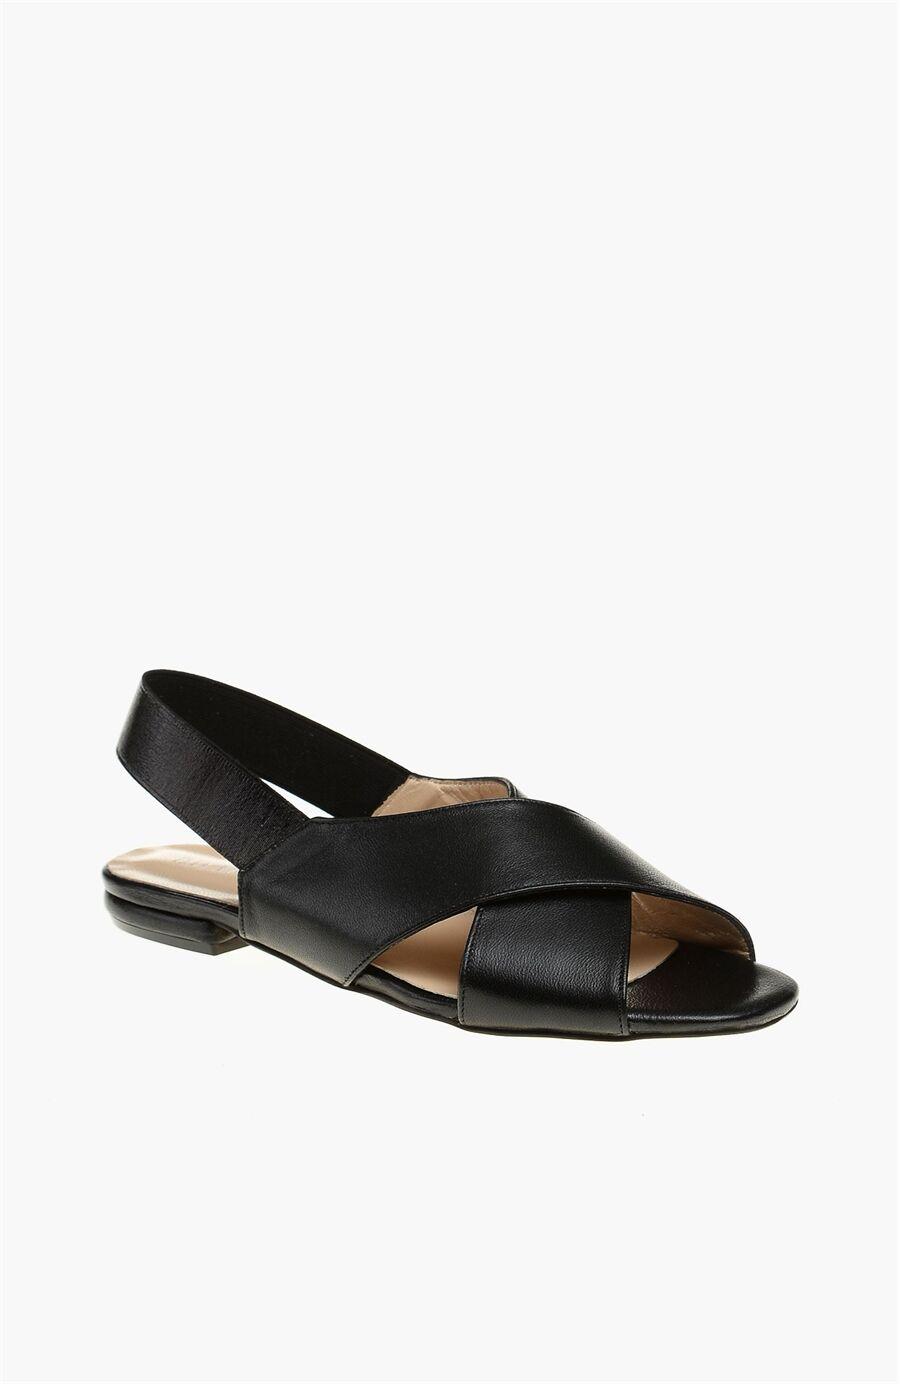 Dıvarese Siyah Sandalet – 239.0 TL